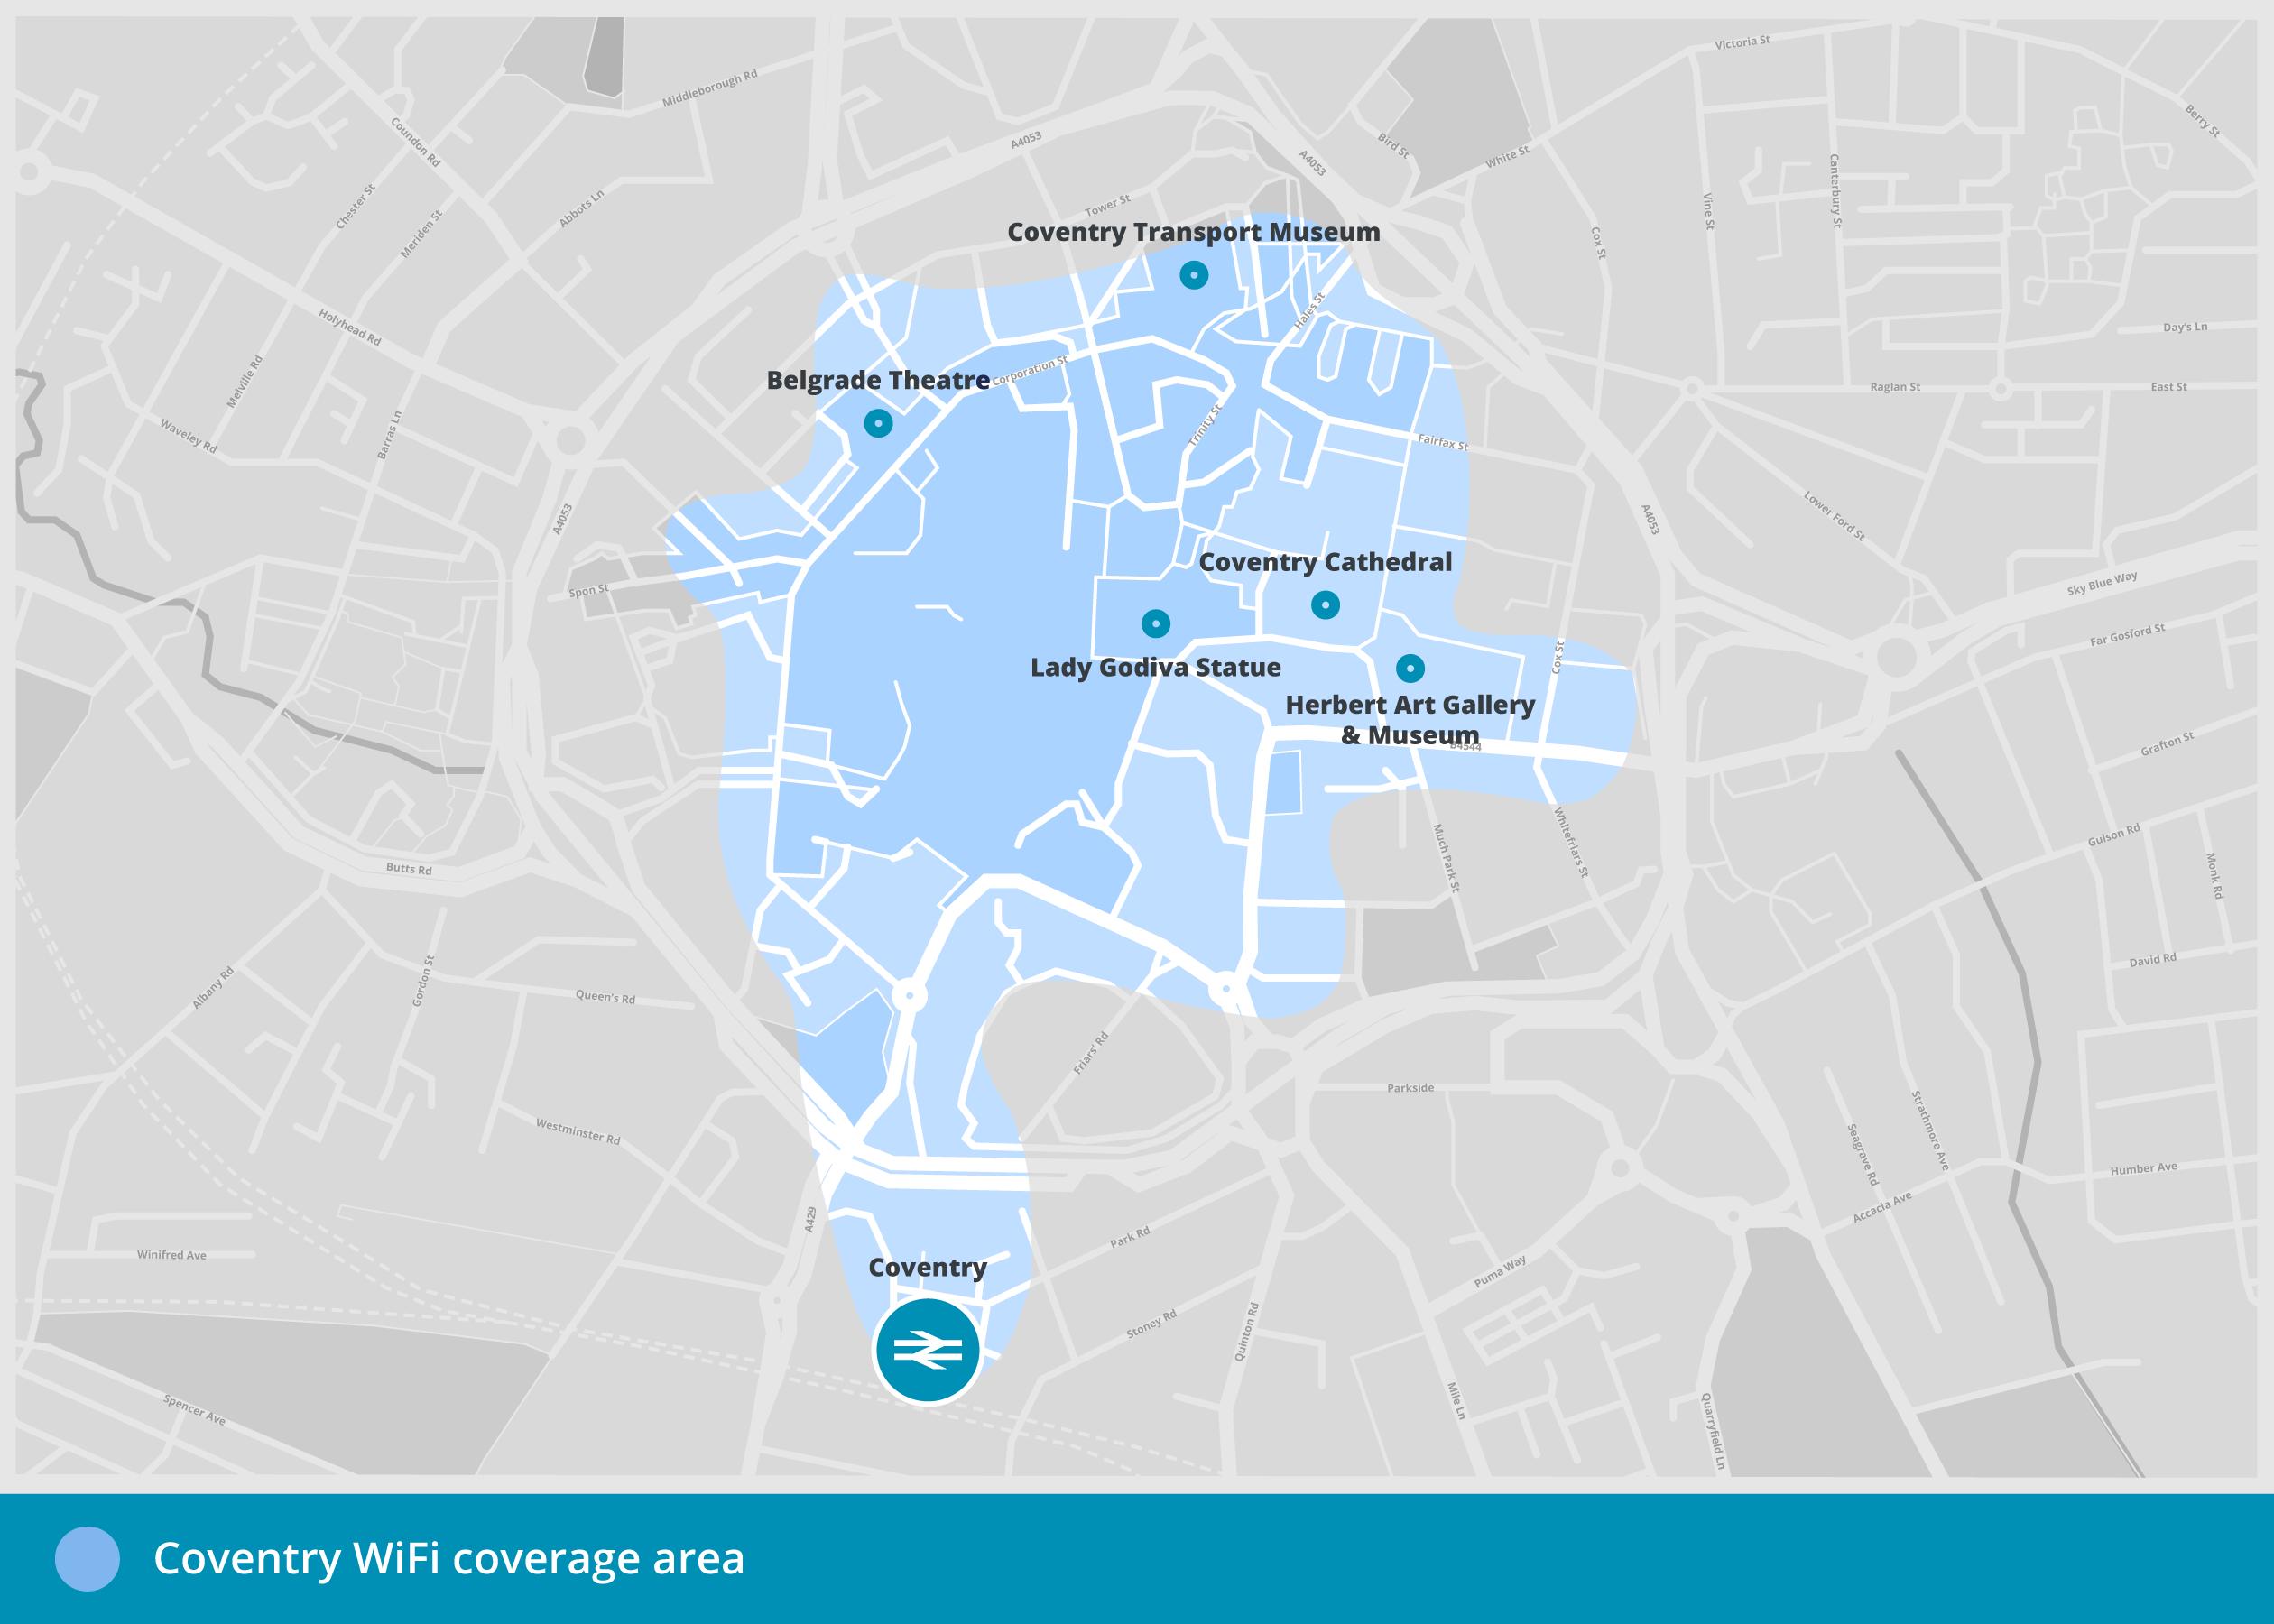 Coventry free WiFi - Coventry free WiFi coverage area